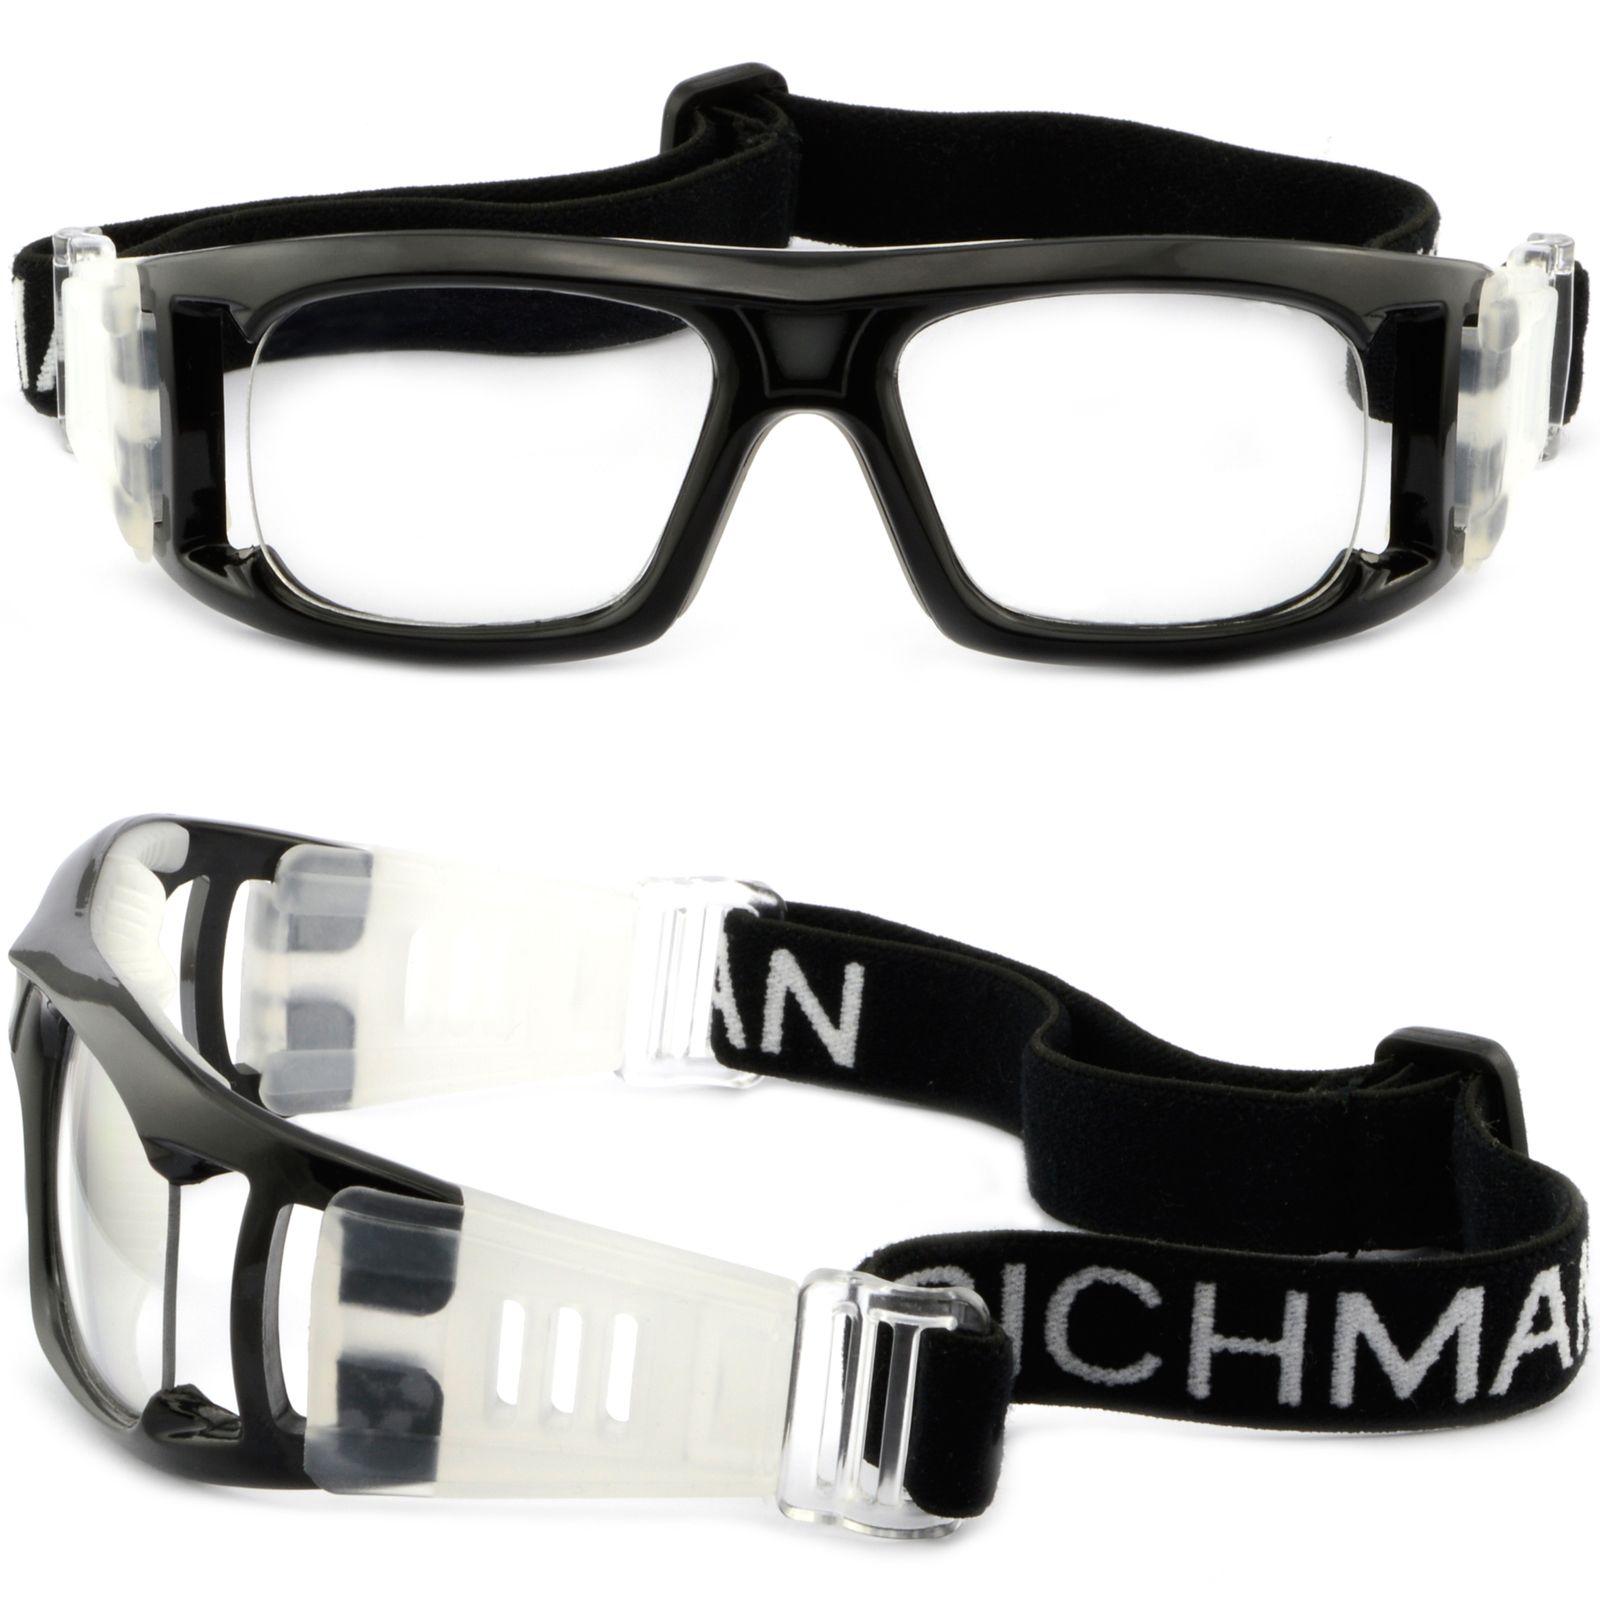 f0569baff6 Men Women Sport Protection Goggles Tennis Prescription Glasses Wrap Around  Black Glasses Frame Online with  43.06 Piece on Aceglasses s Store